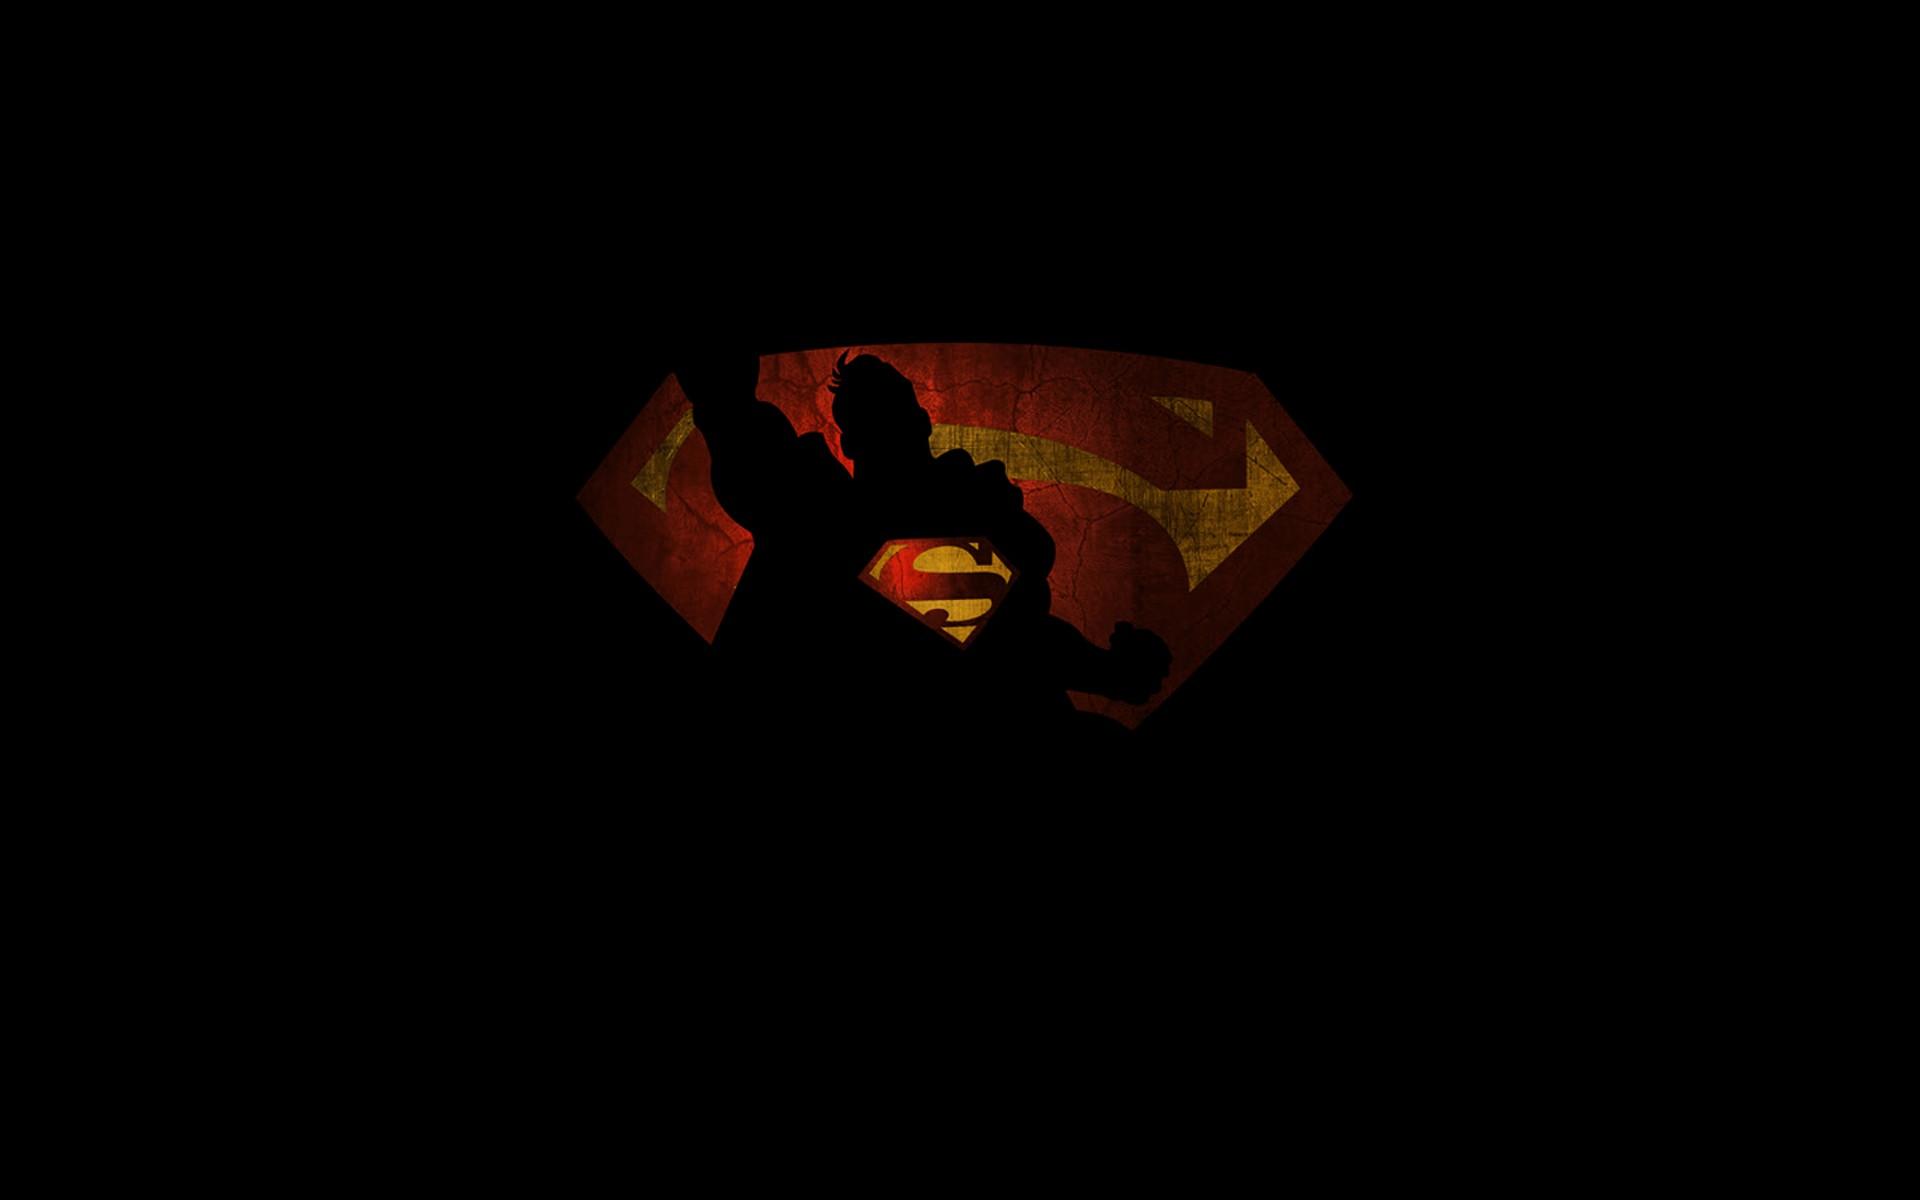 superman wallpaper red wallpaper batman vs superman dark superman 1920x1200